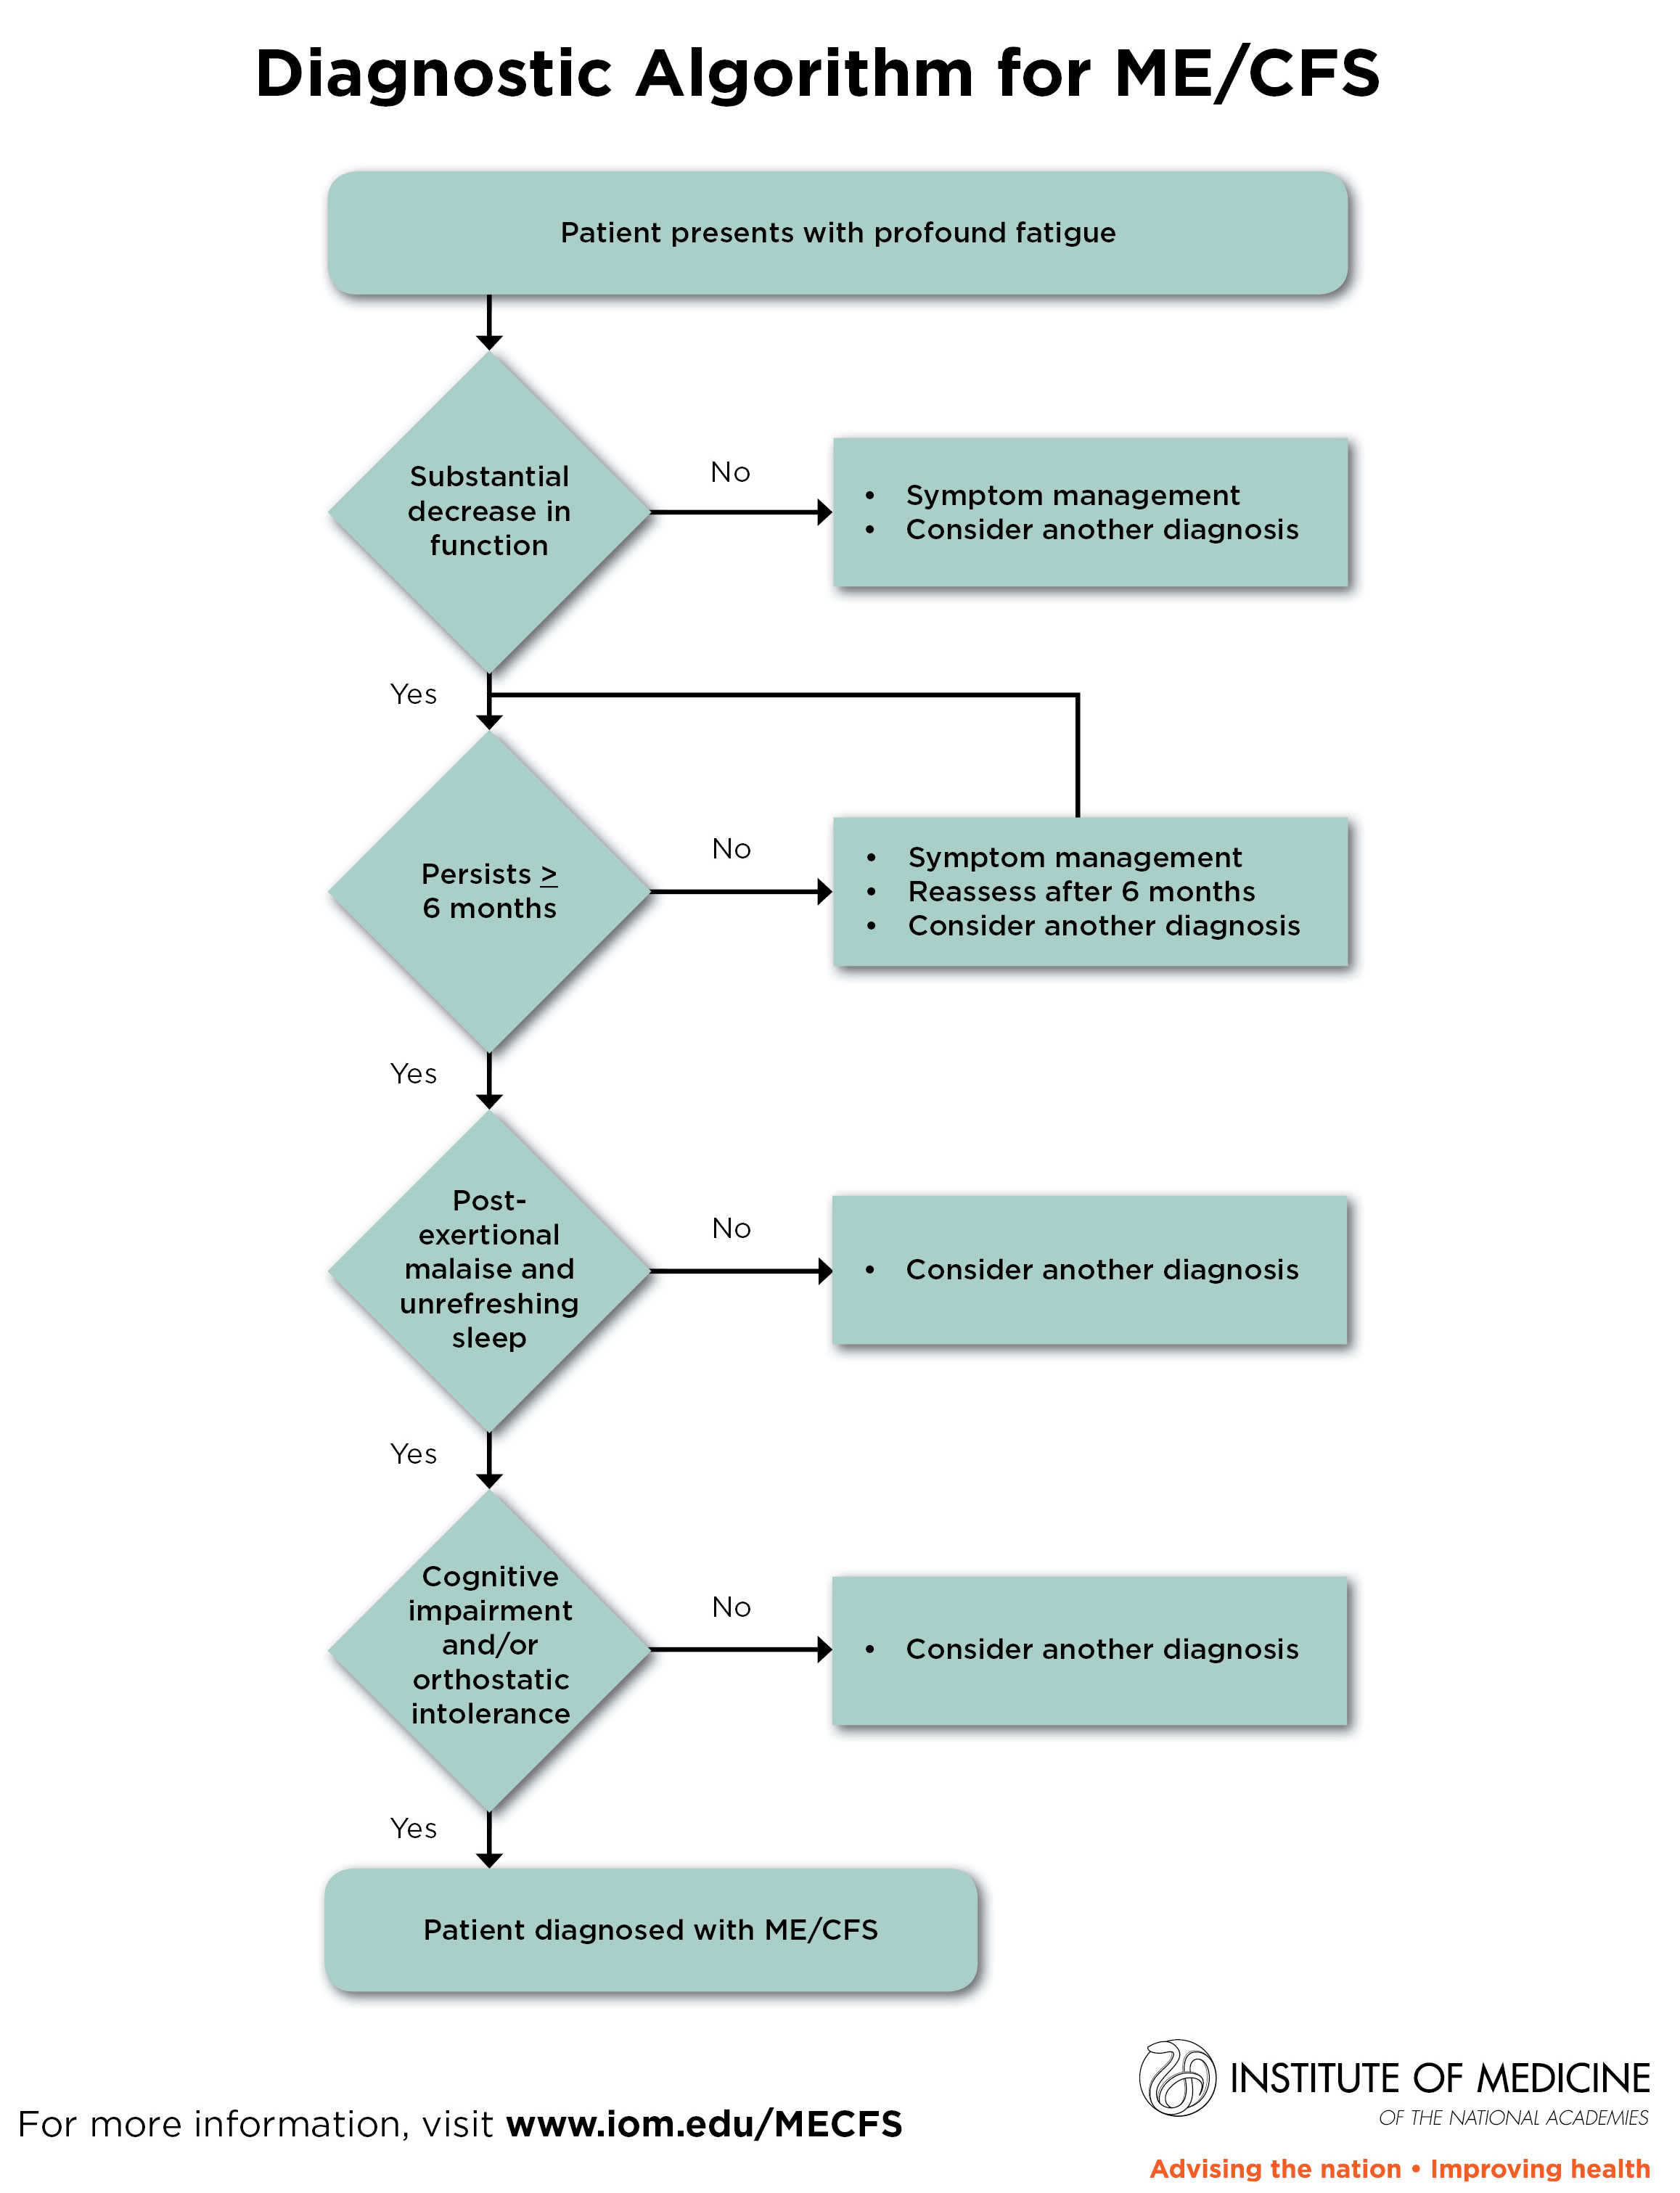 Diagnostic Algorithm for Chronic Fatigue